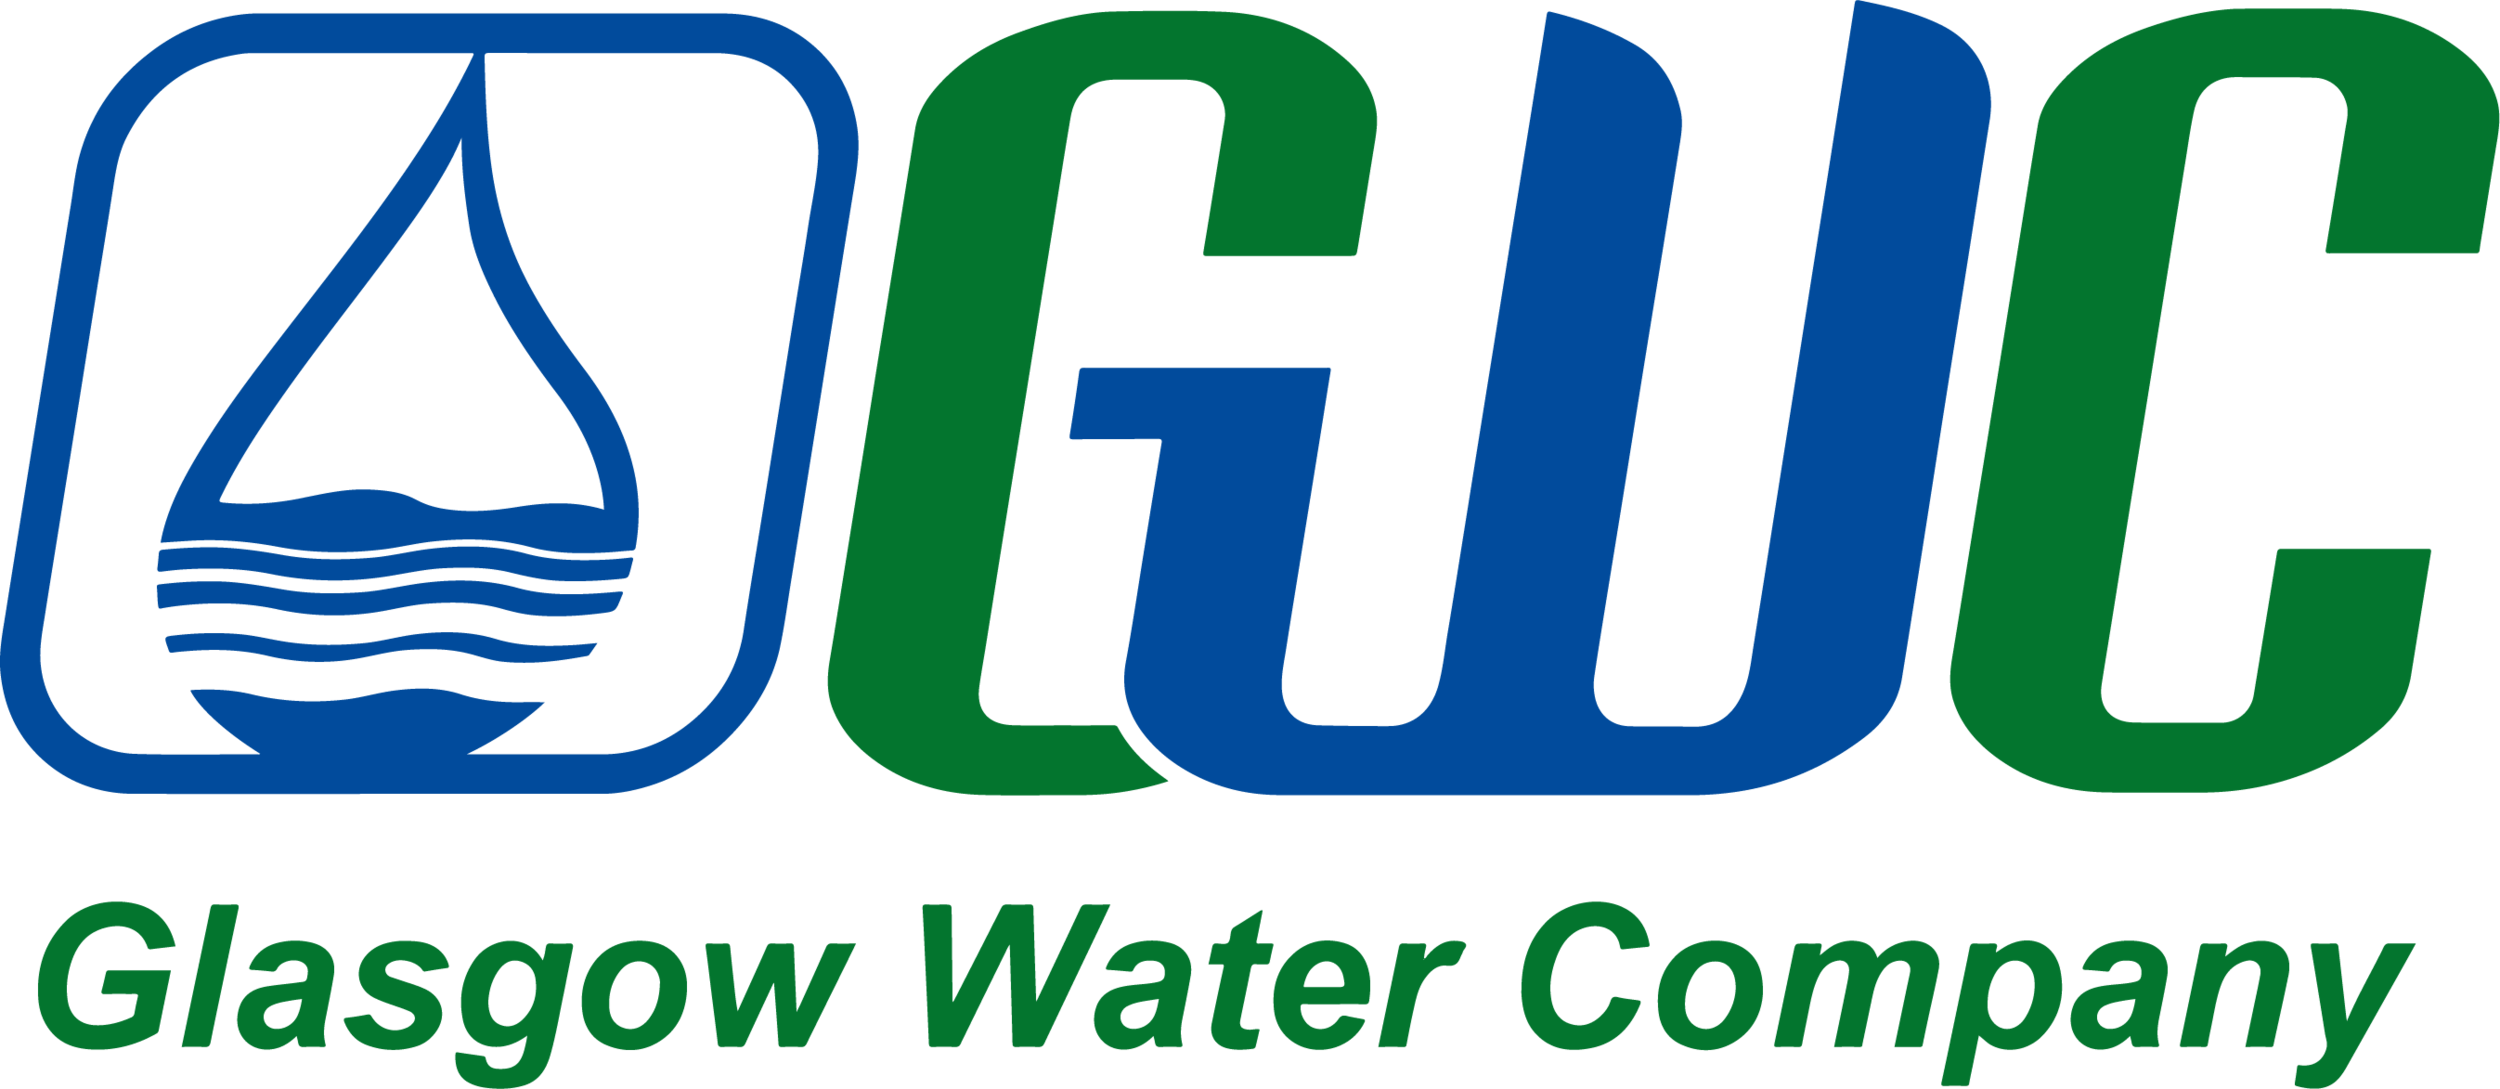 GWC logo w name.png